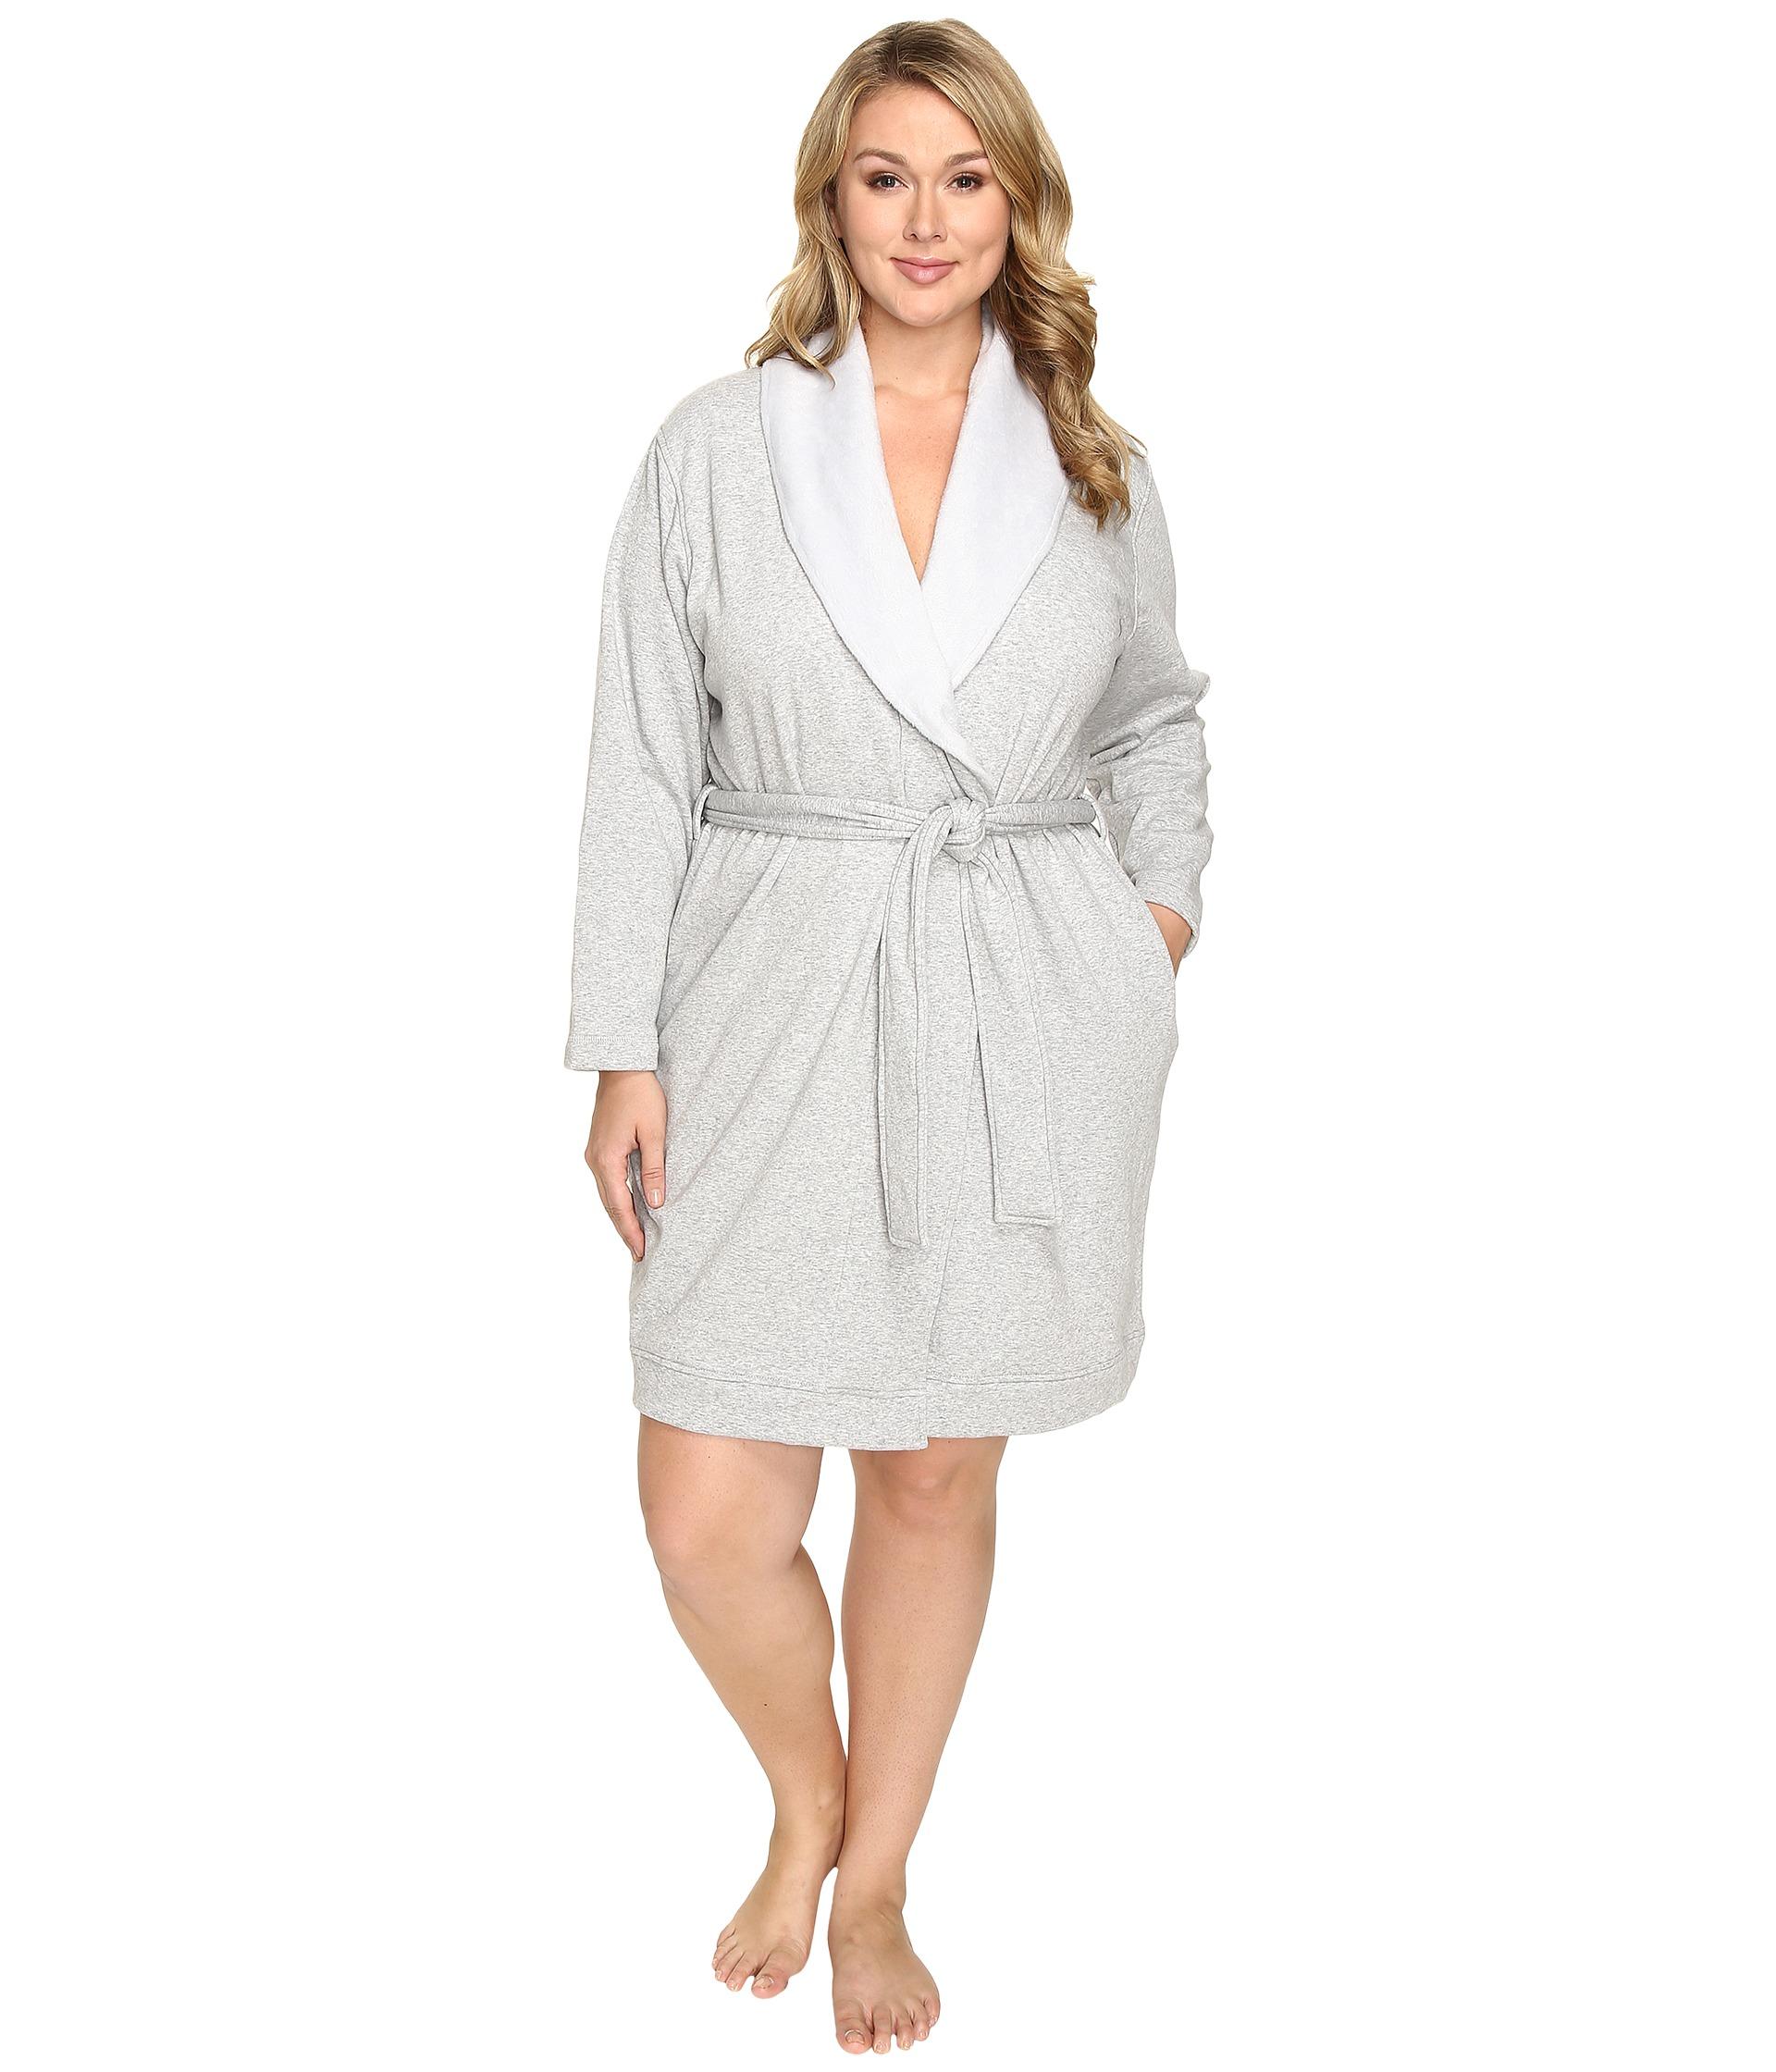 Robe Australia: Ugg Blanche Robe Sale